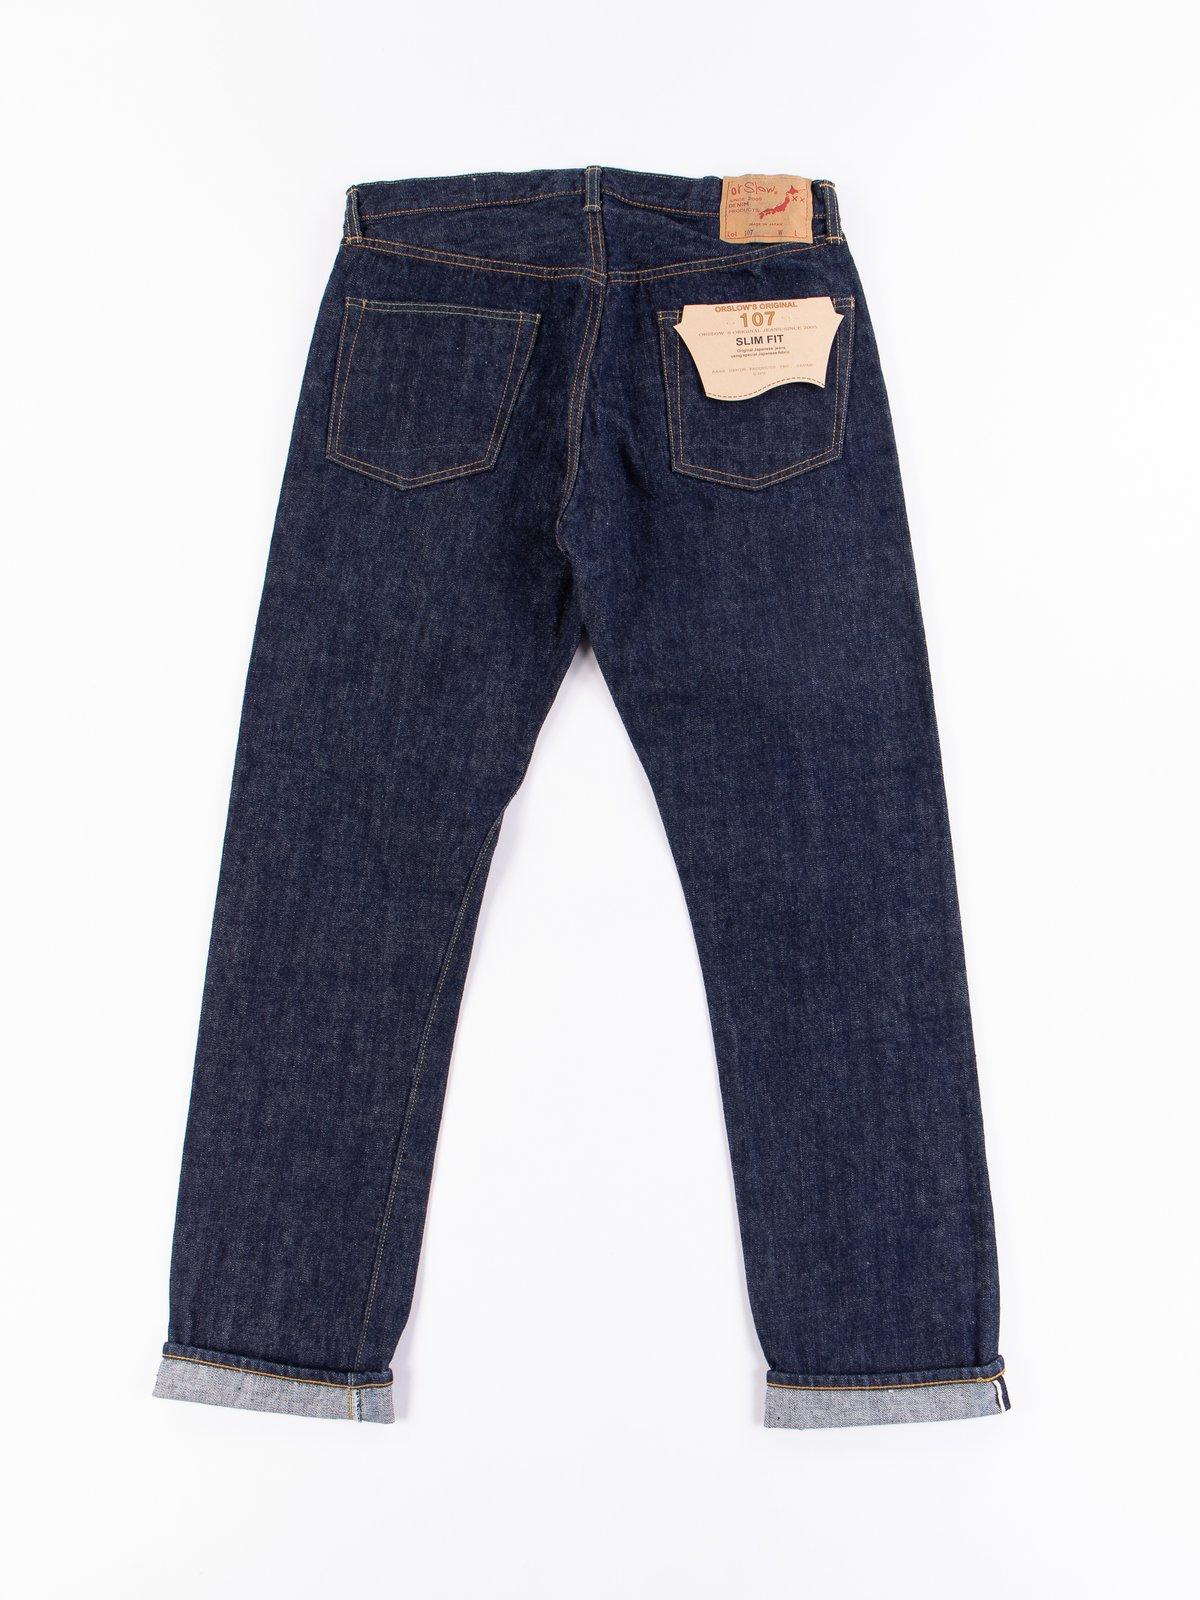 Indigo One Wash 107 Slim Fit Jean - Image 7